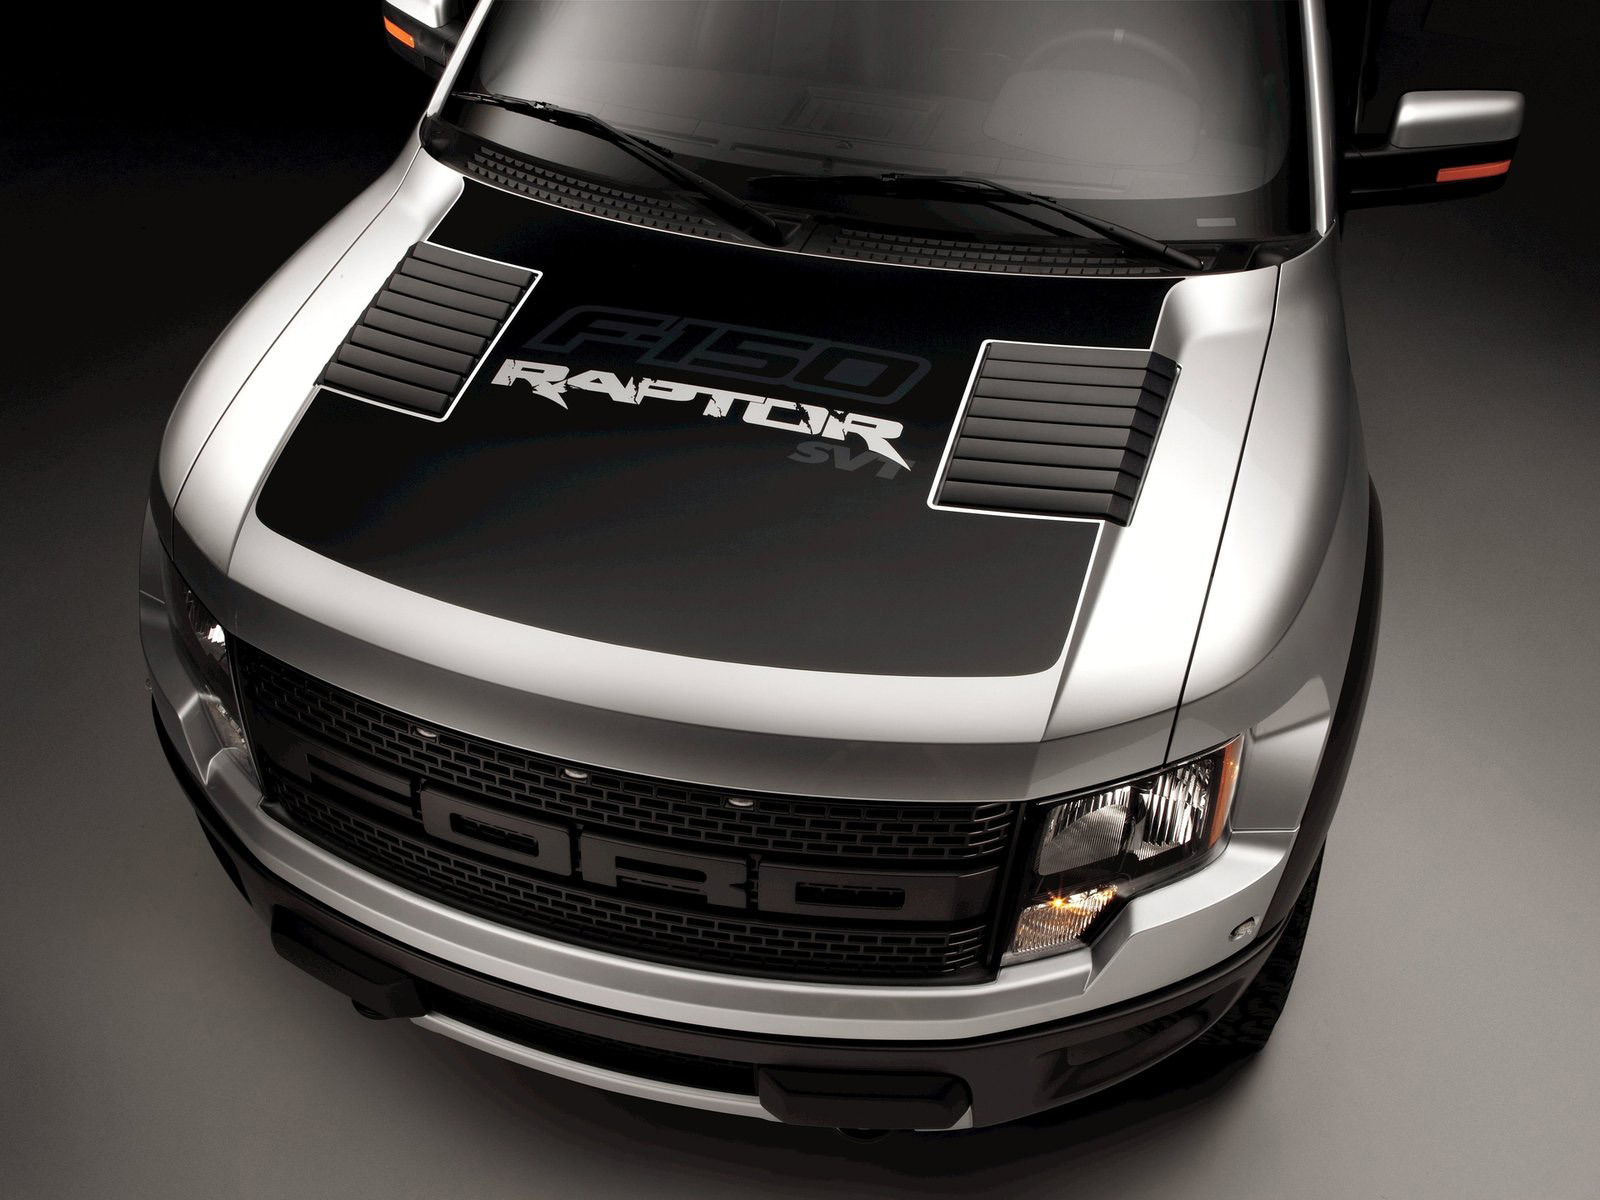 Ford-F-150_SVT_Raptor_SuperCrew_2011_1600x1200_wallpaper_09